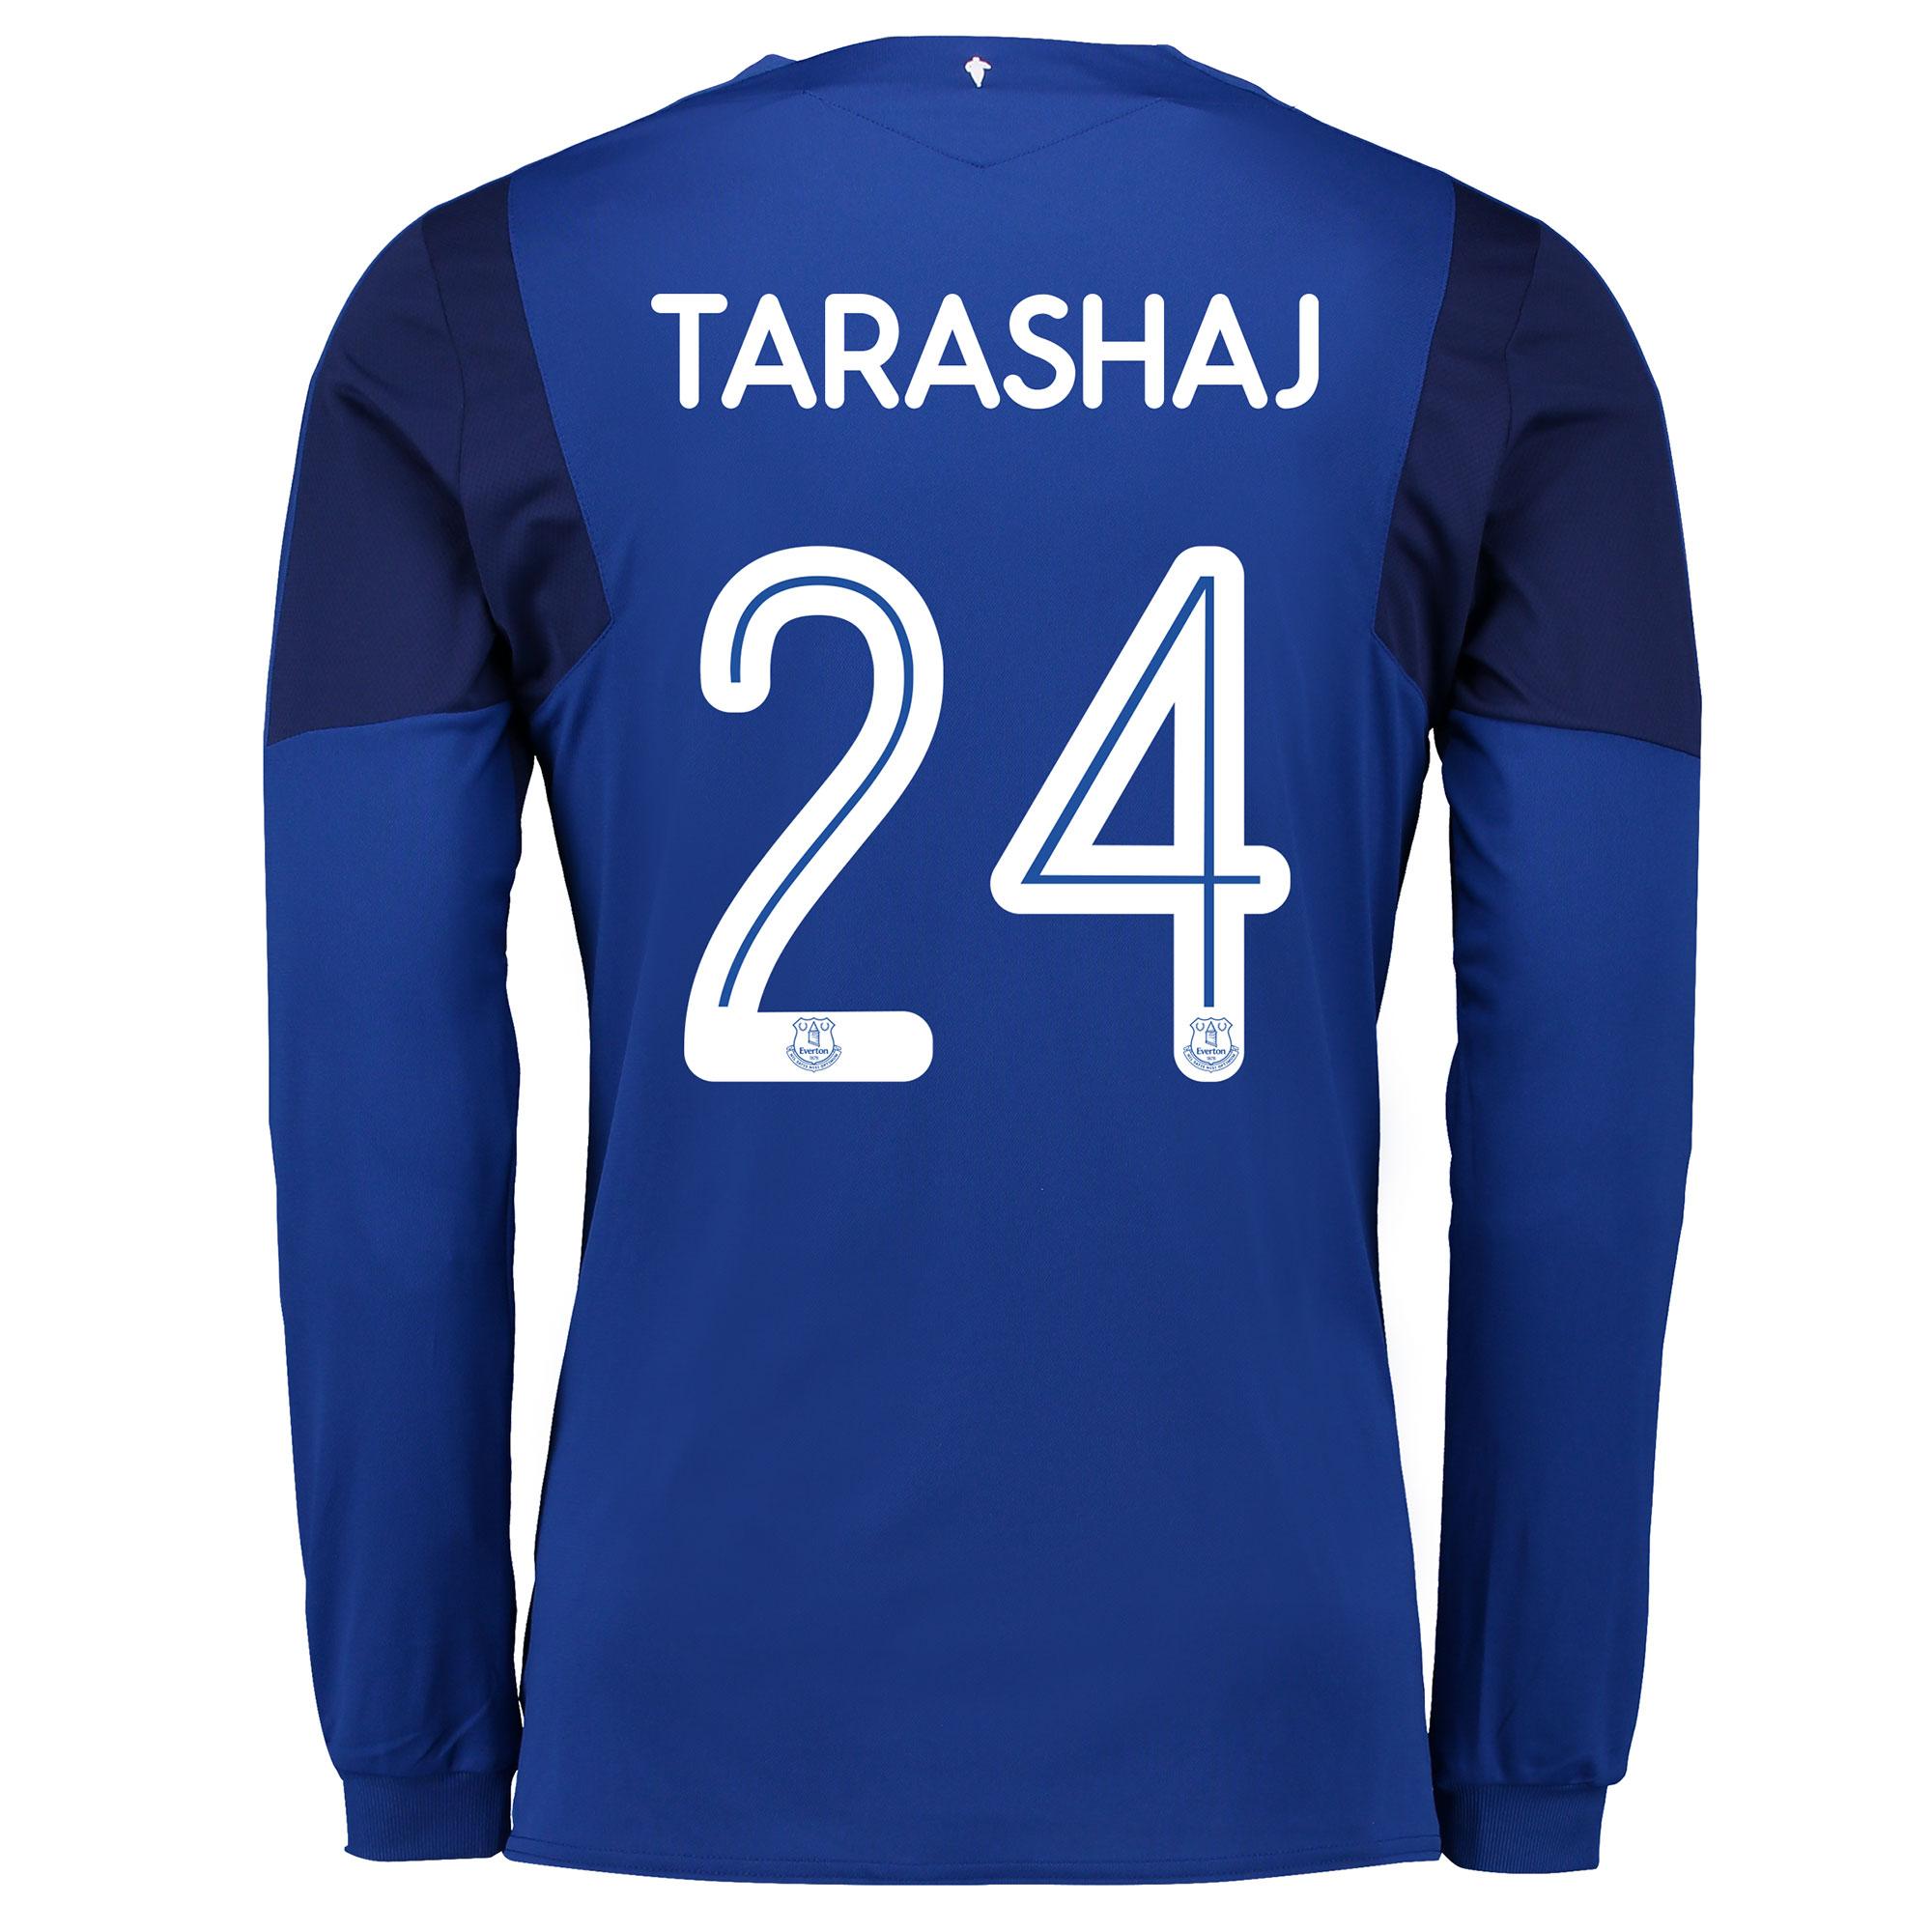 Image of Everton Home Cup Shirt 2017/18 - Junior - Long Sleeved with Tarashaj 2